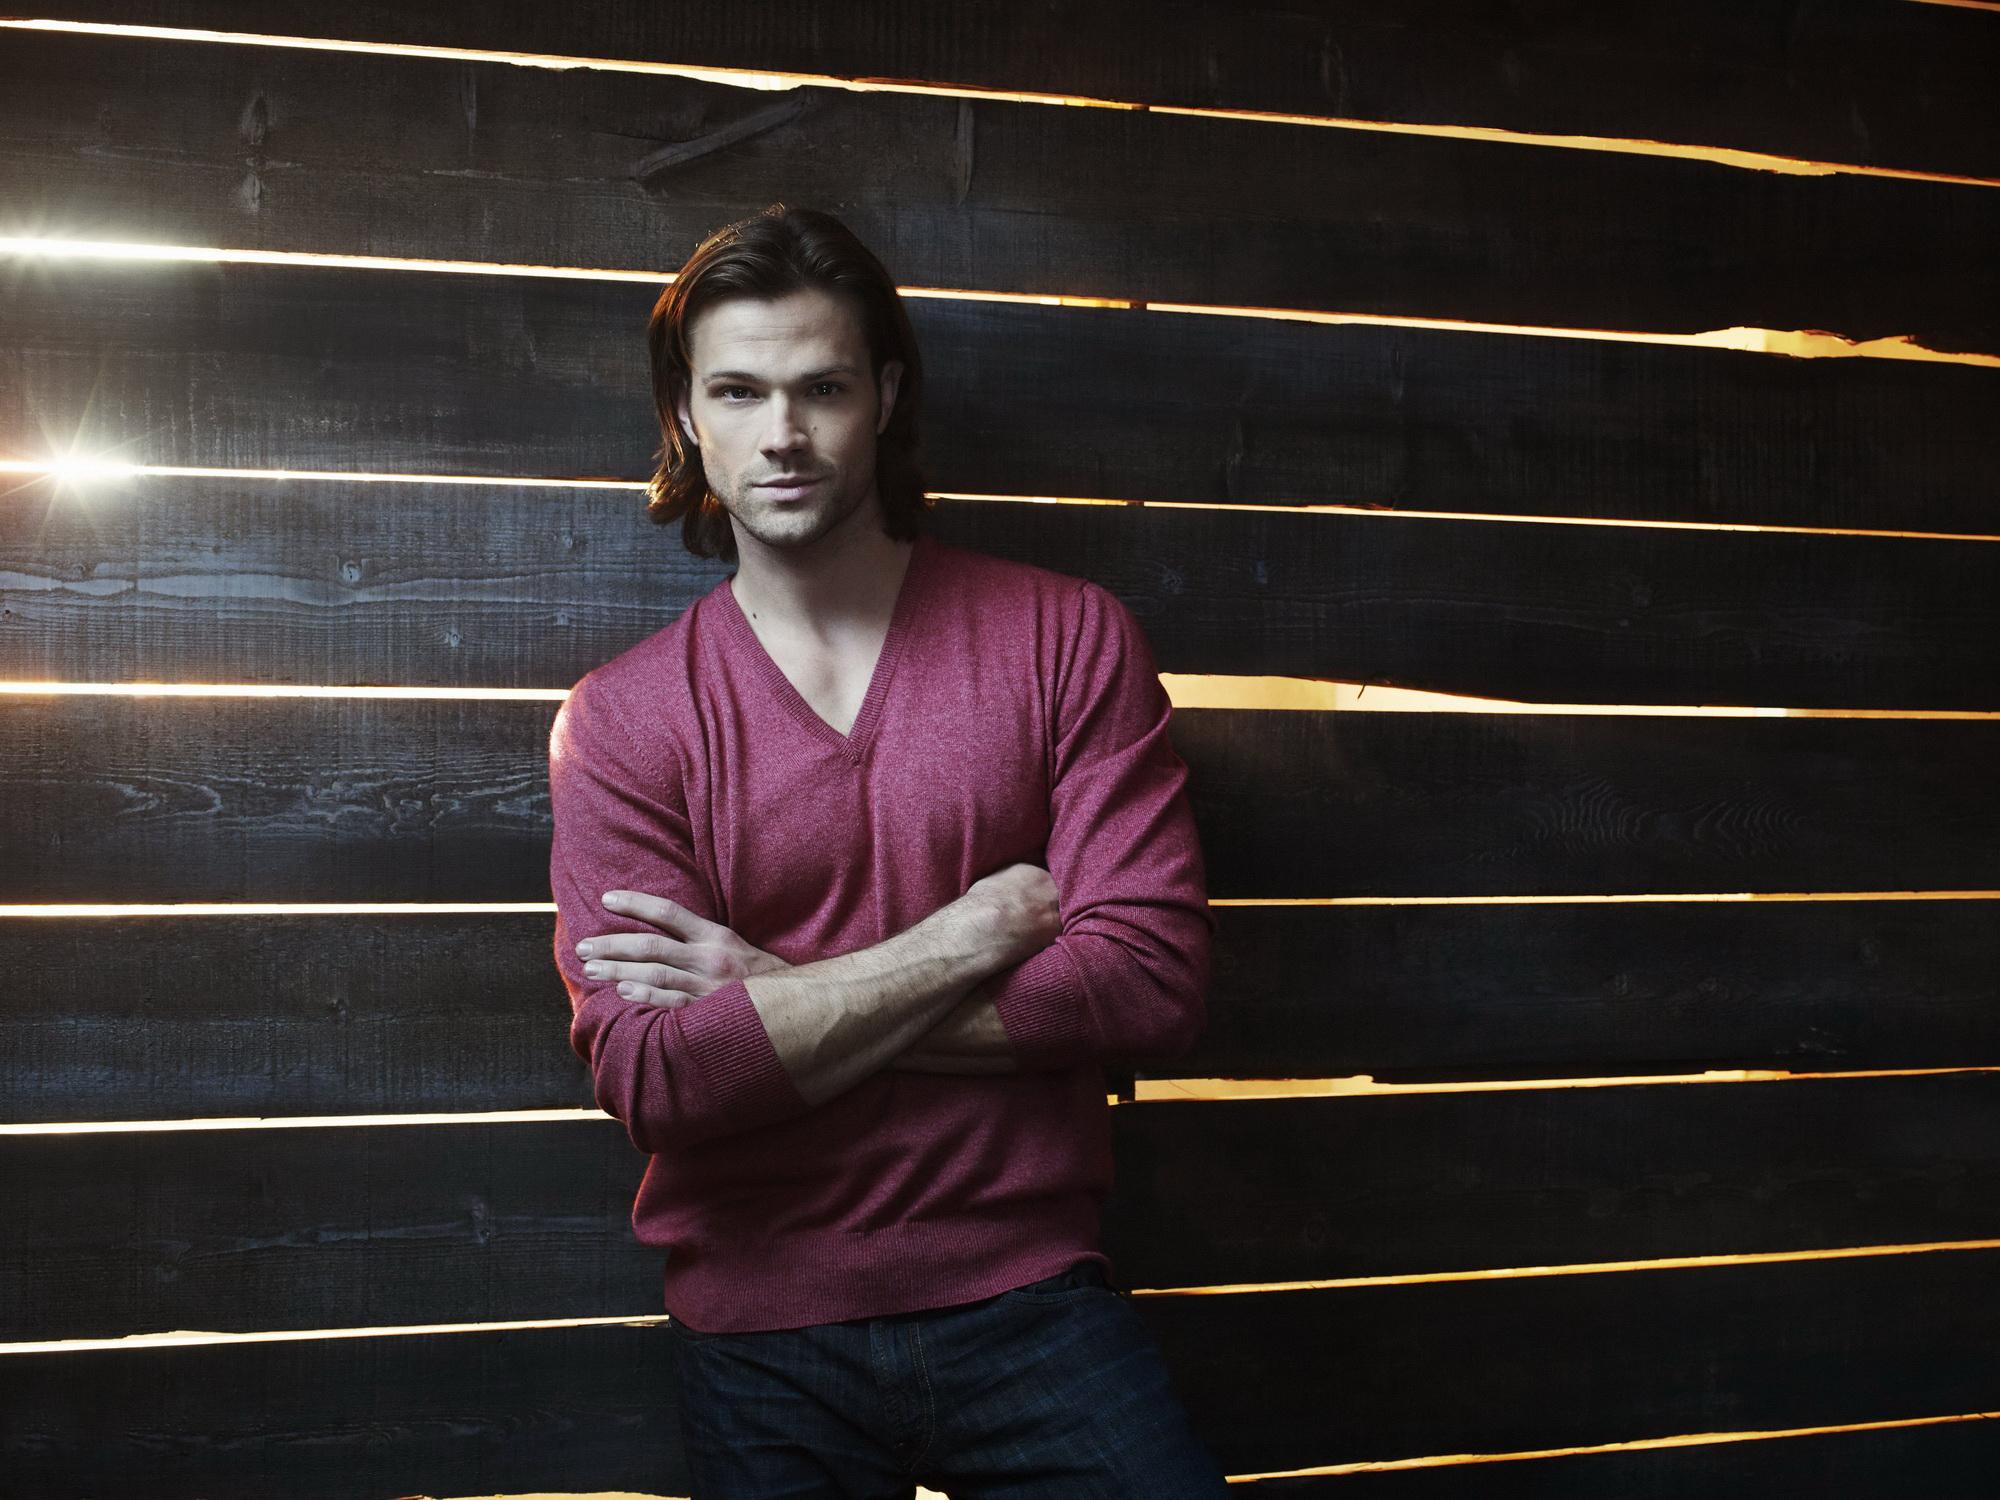 supernatural season 9 jared and jensen promo shots